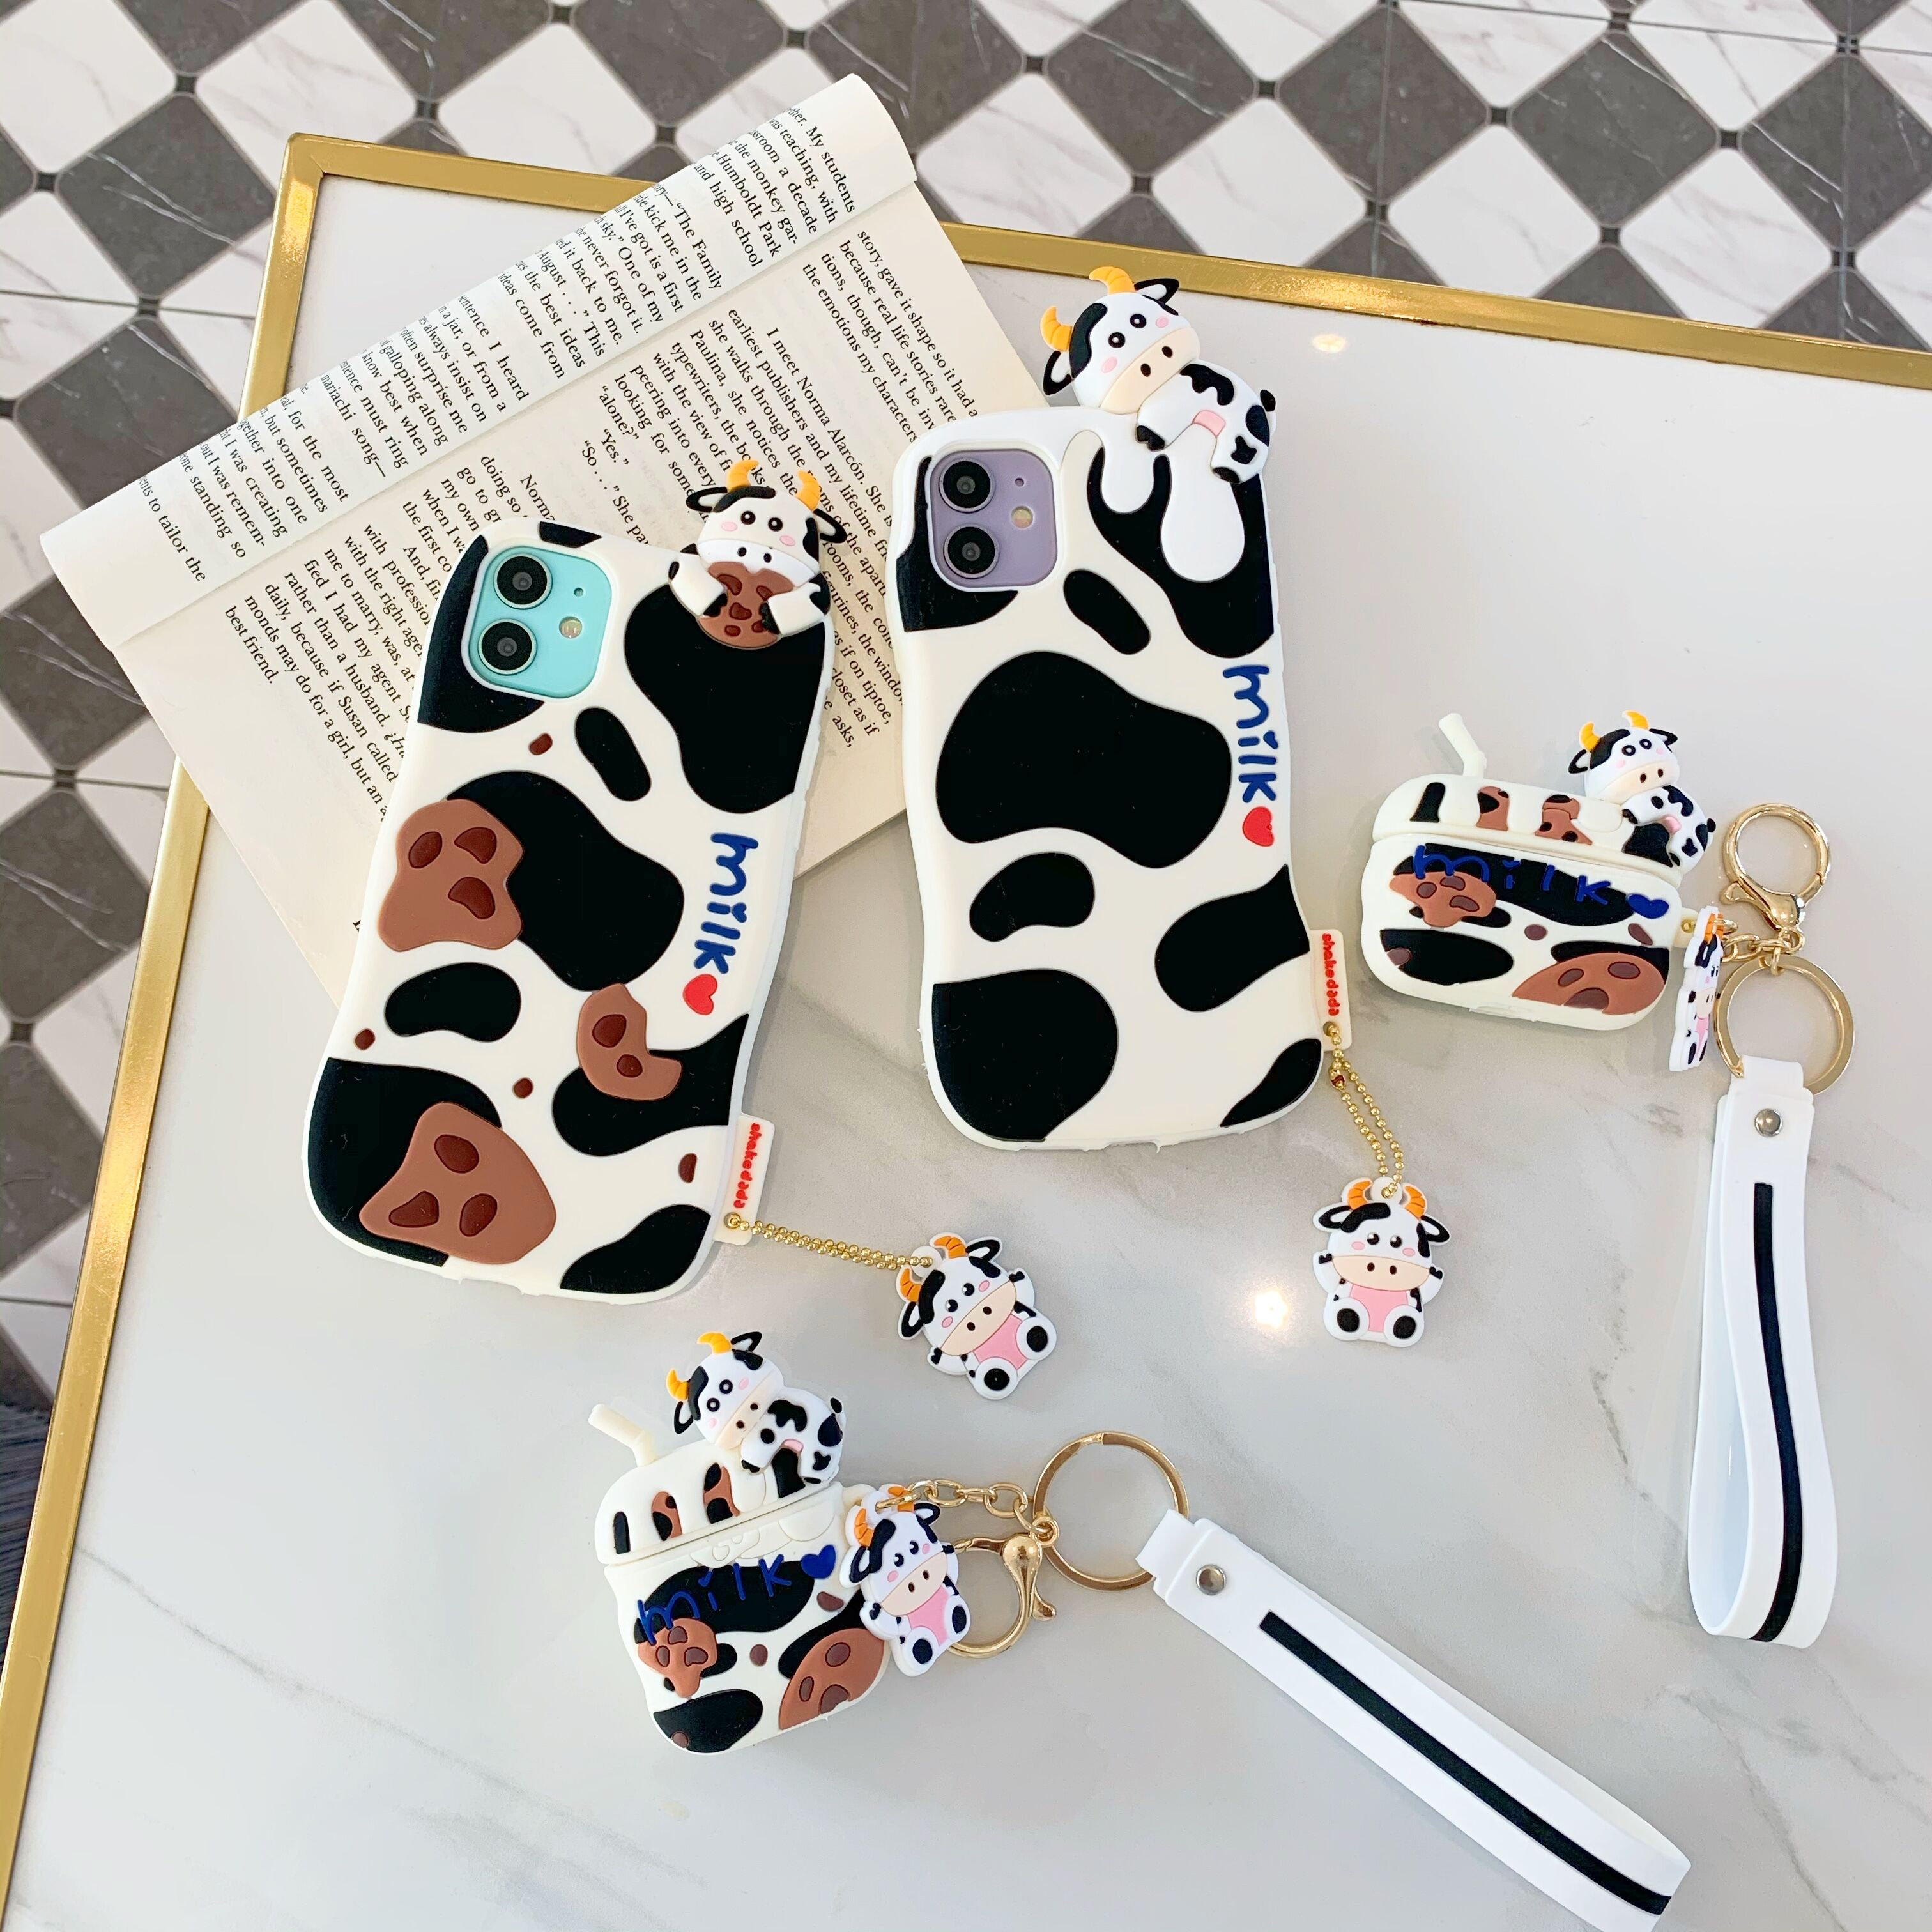 タオバオ仕入れ代行-ibuy99 iphone 创意个性卡通奶牛立体硅胶手机壳适用苹果iphone12/7p8p/11耳机壳